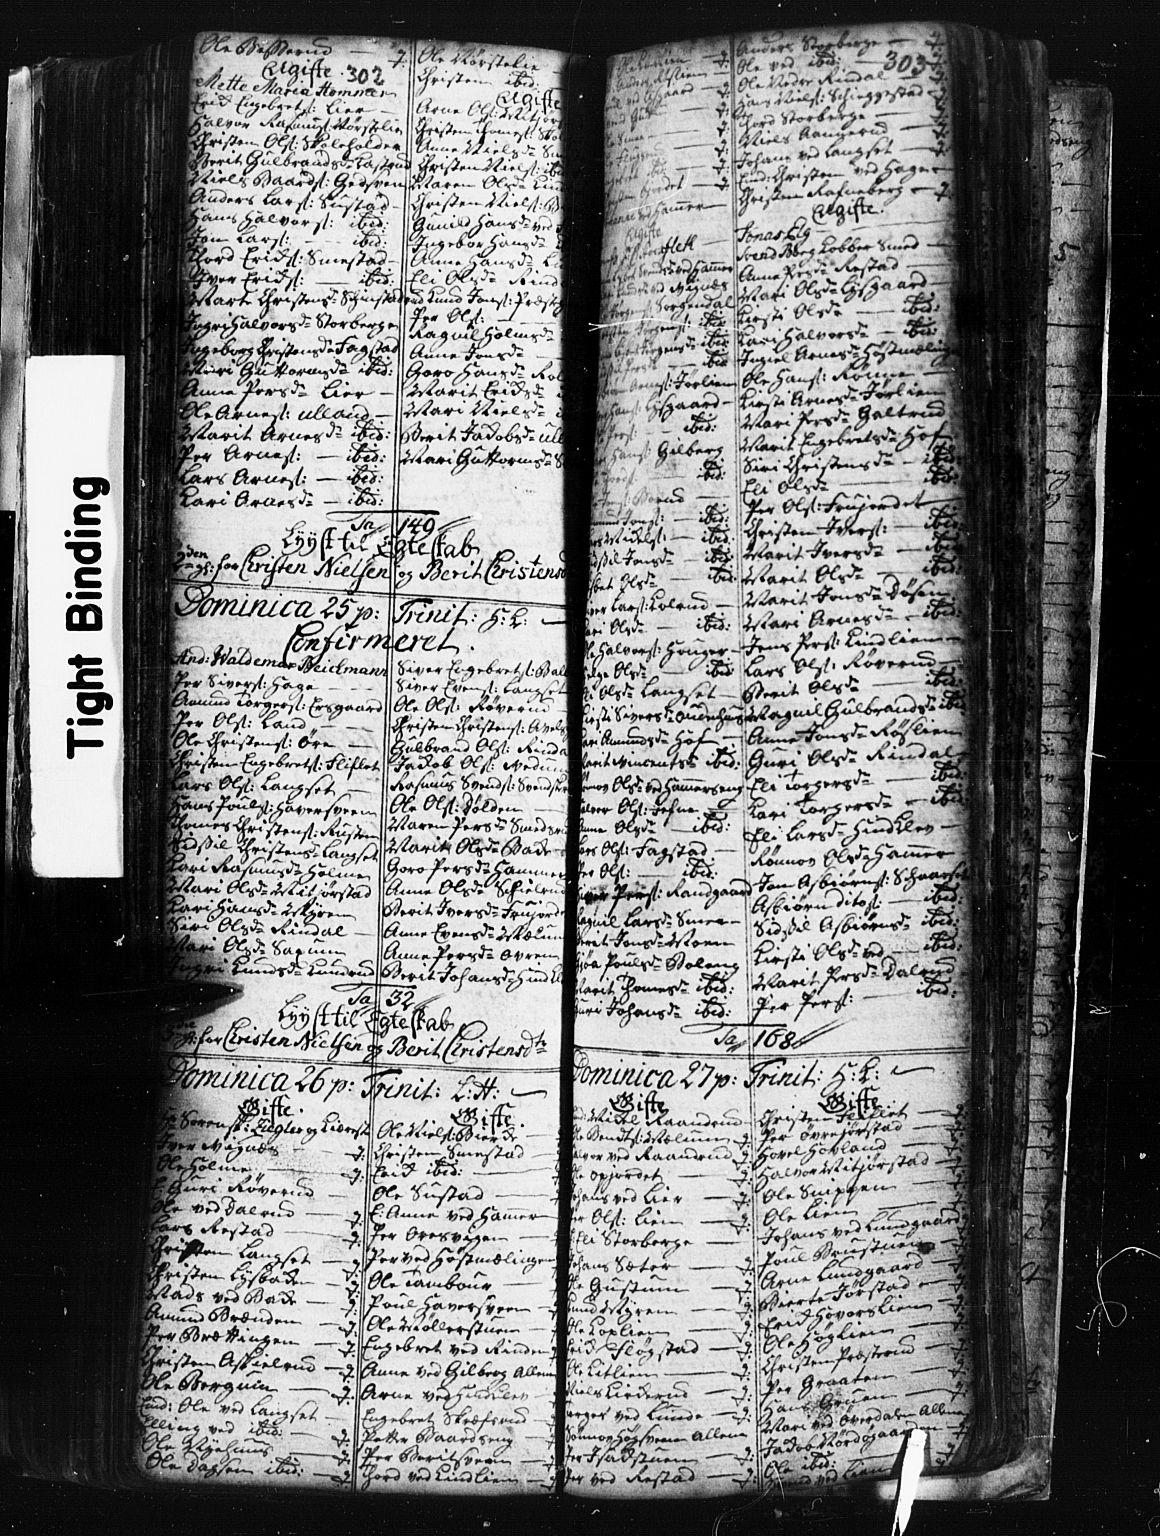 SAH, Fåberg prestekontor, Klokkerbok nr. 1, 1727-1767, s. 302-303